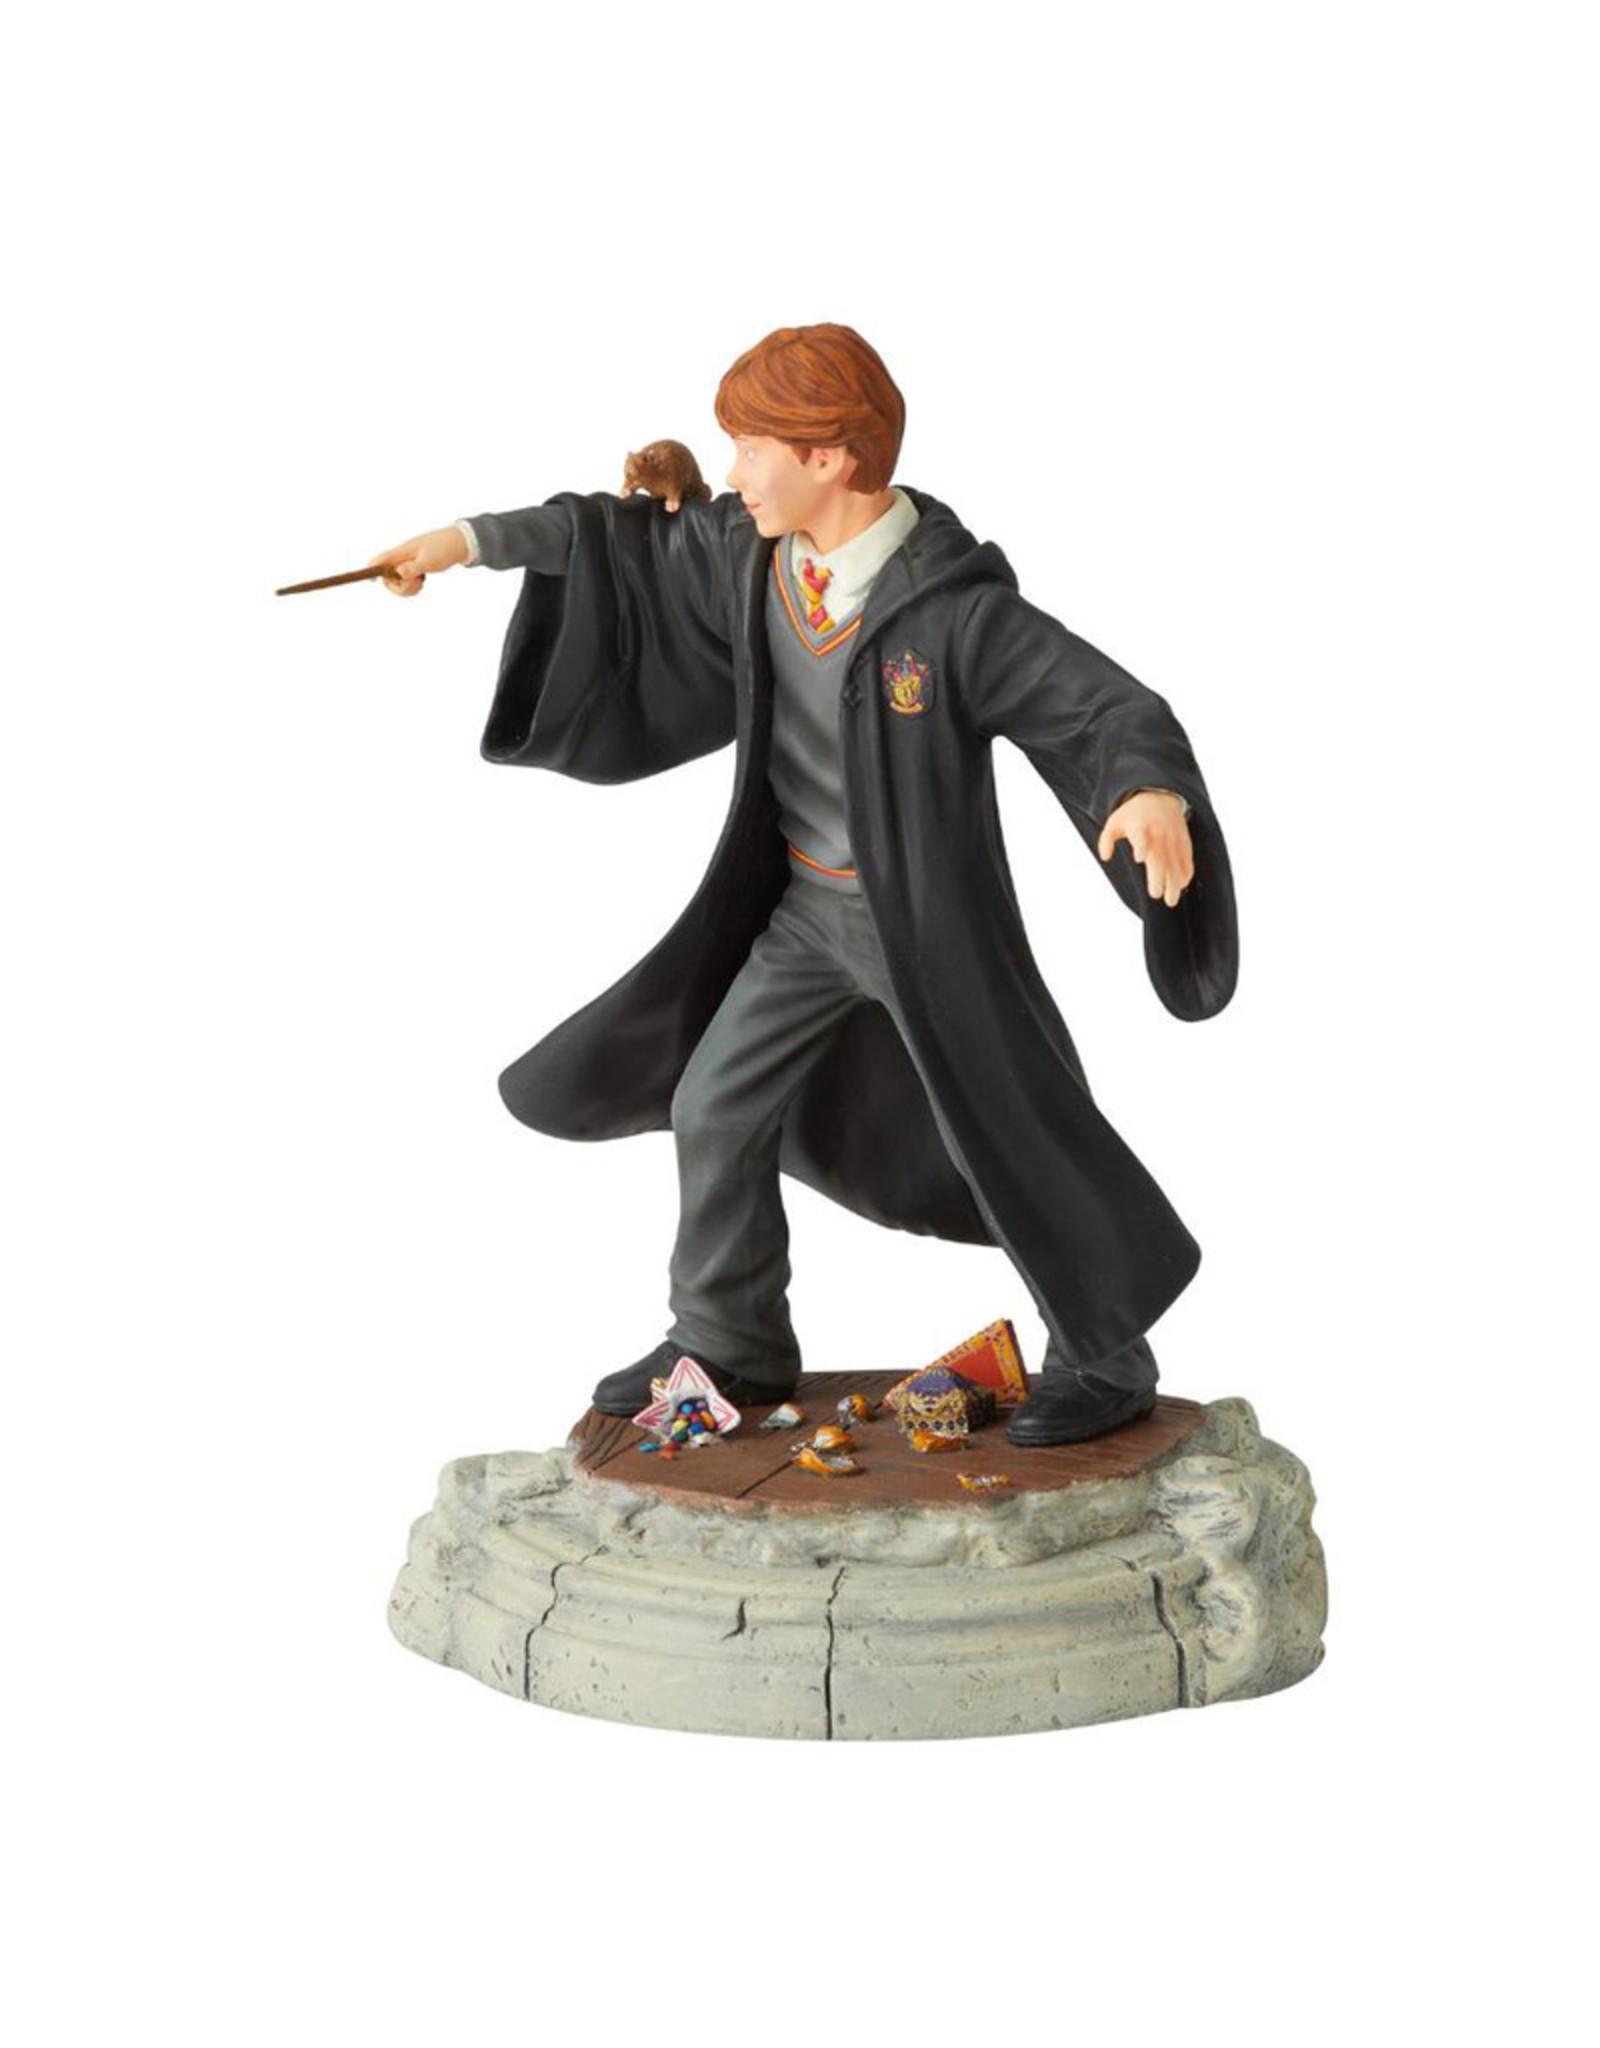 Harry Potter Harry Potter ( Wizarding World of Harry Potter Figurine ) Ron Weasley